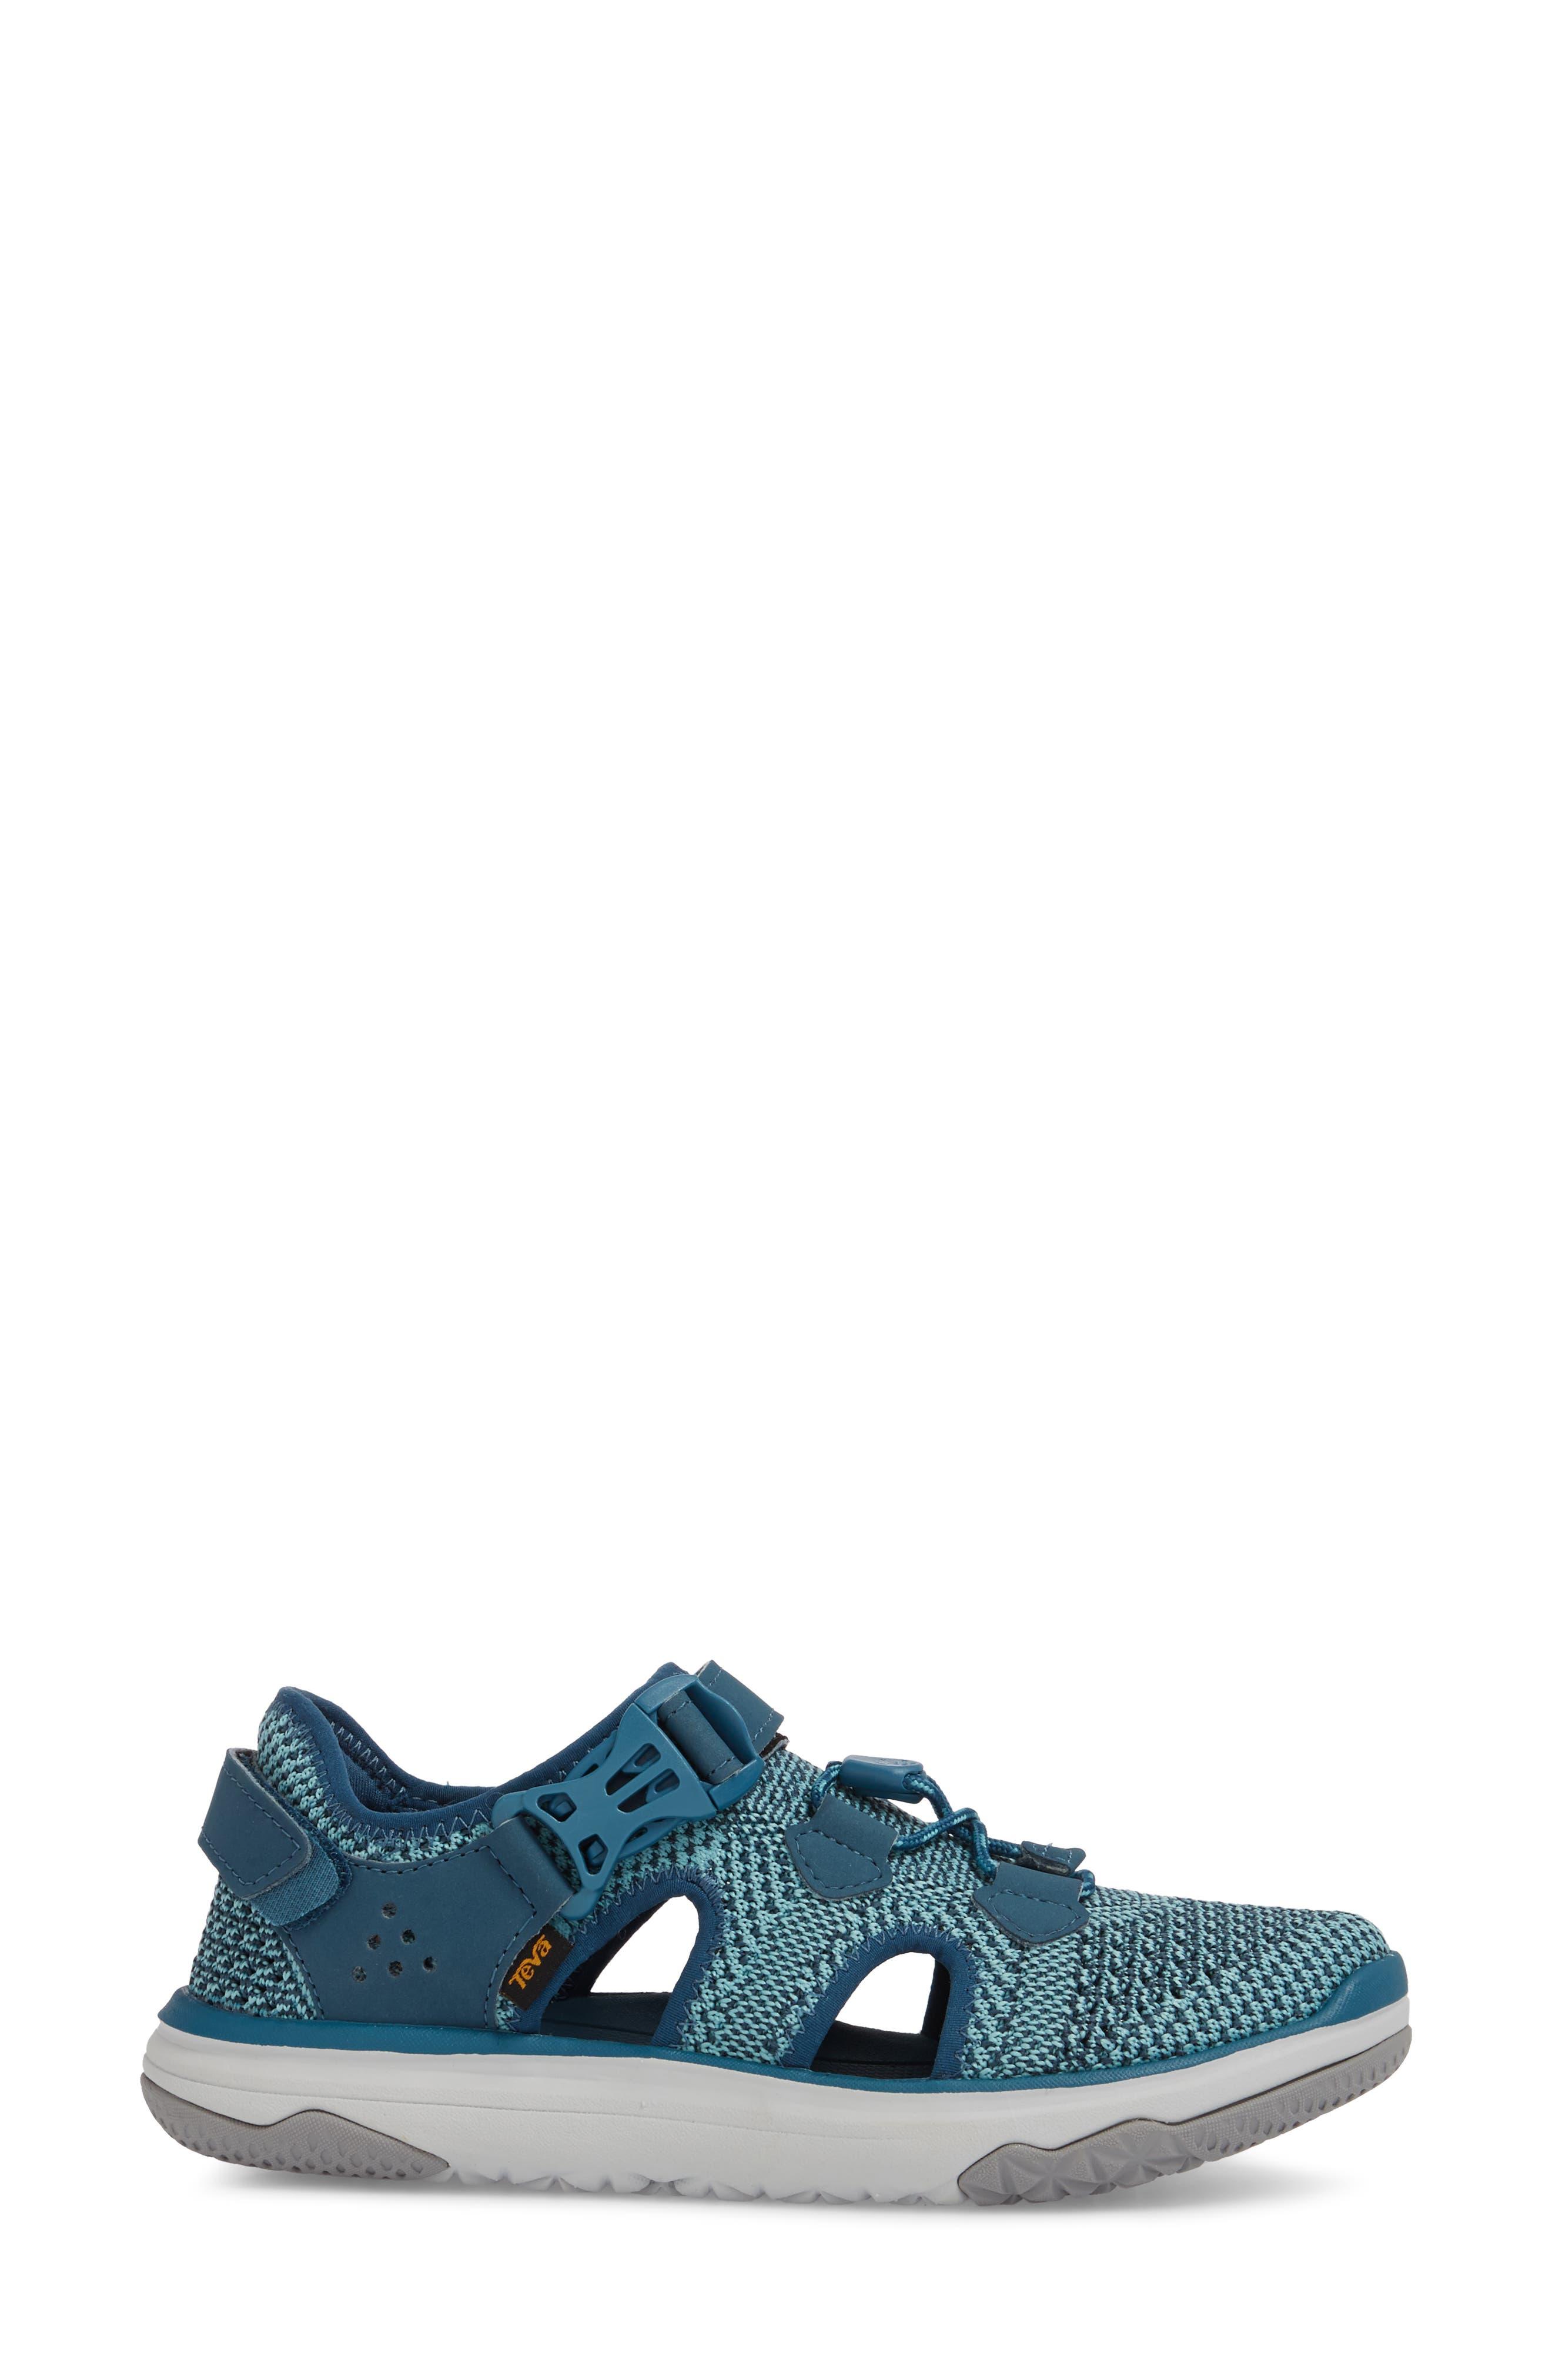 Terra Float Travel Knit Active Sandal,                             Alternate thumbnail 3, color,                             LEGION BLUE